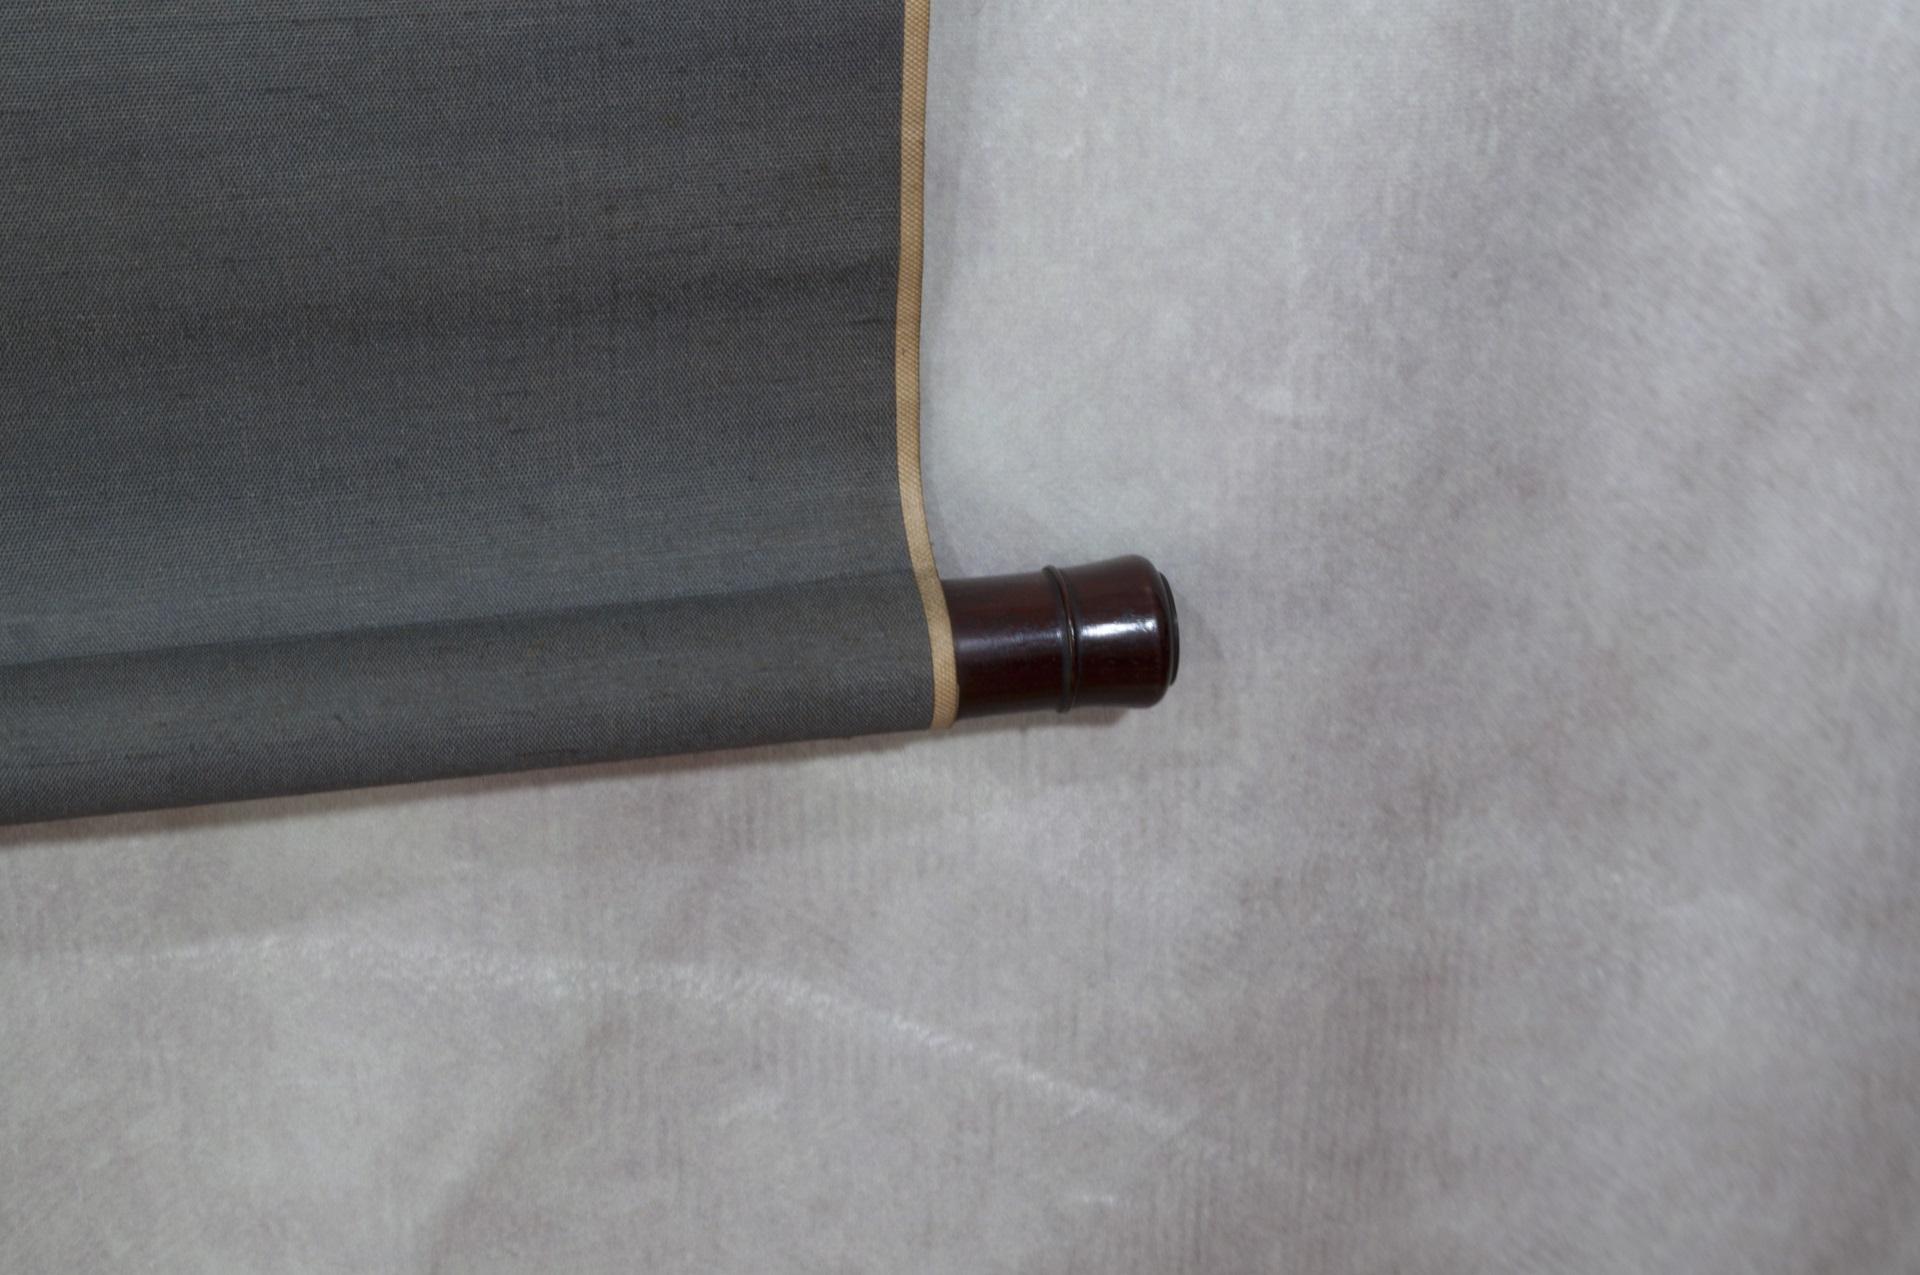 Kakejiku Kakemono Hanging scroll 1 (3)